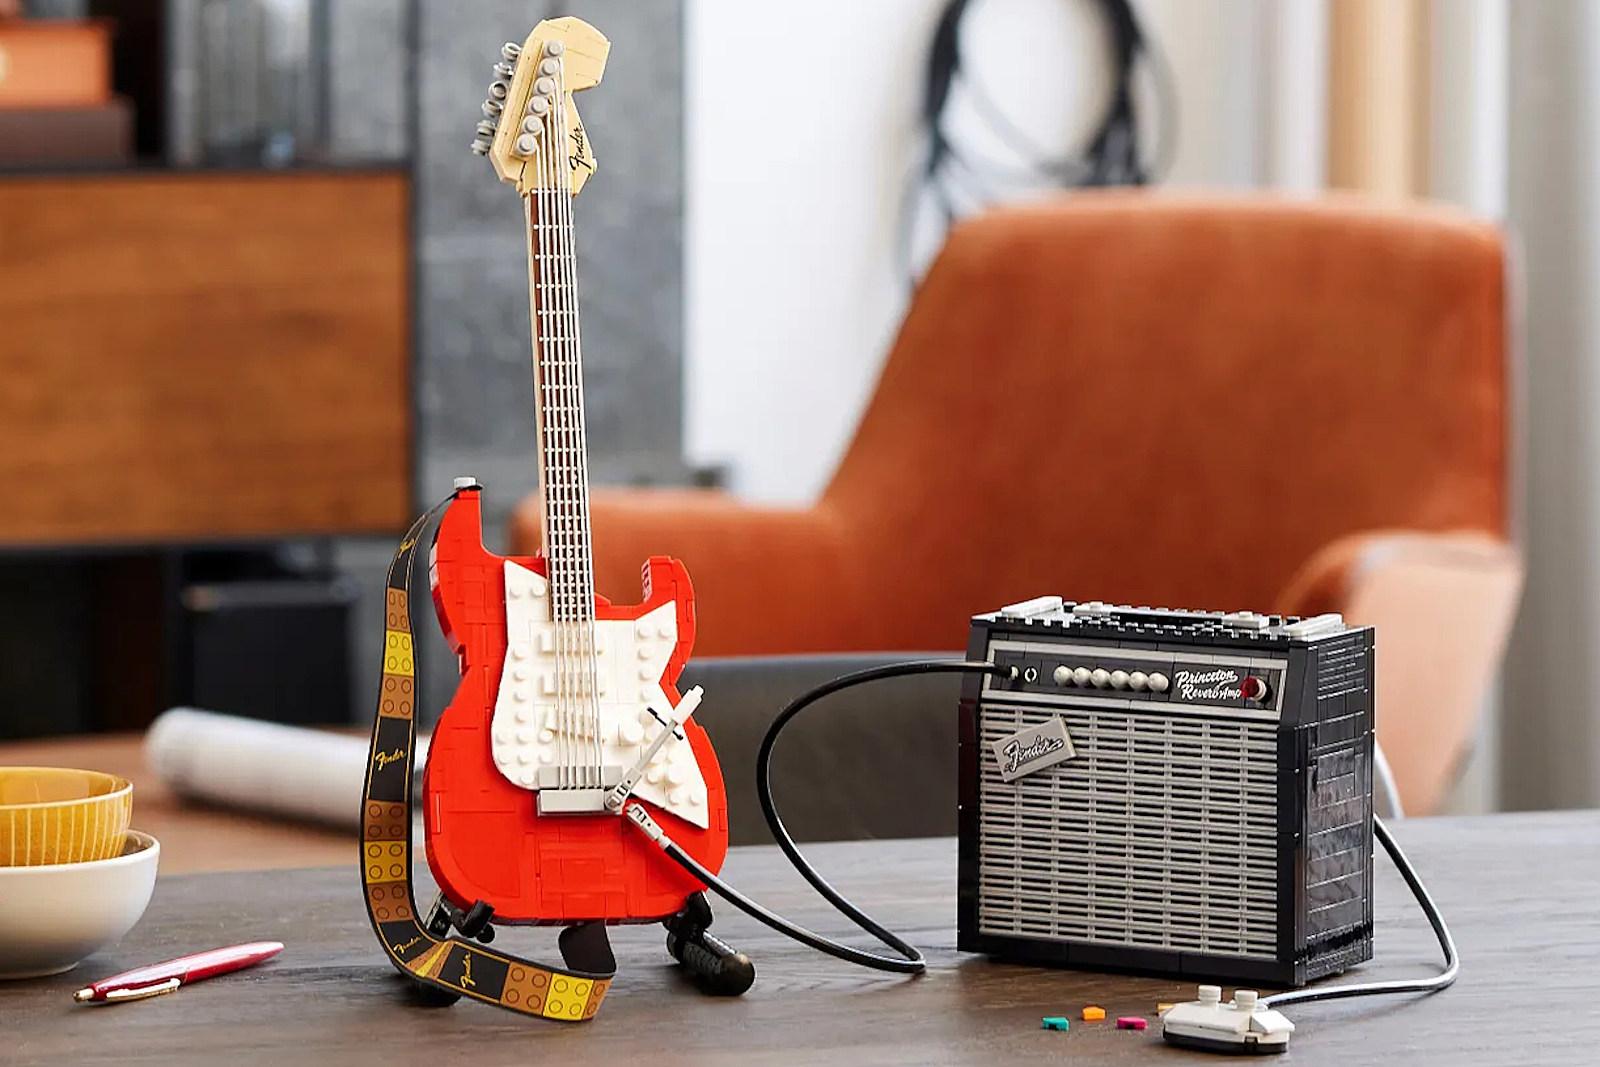 Lego Unveils Fender Stratocaster Set